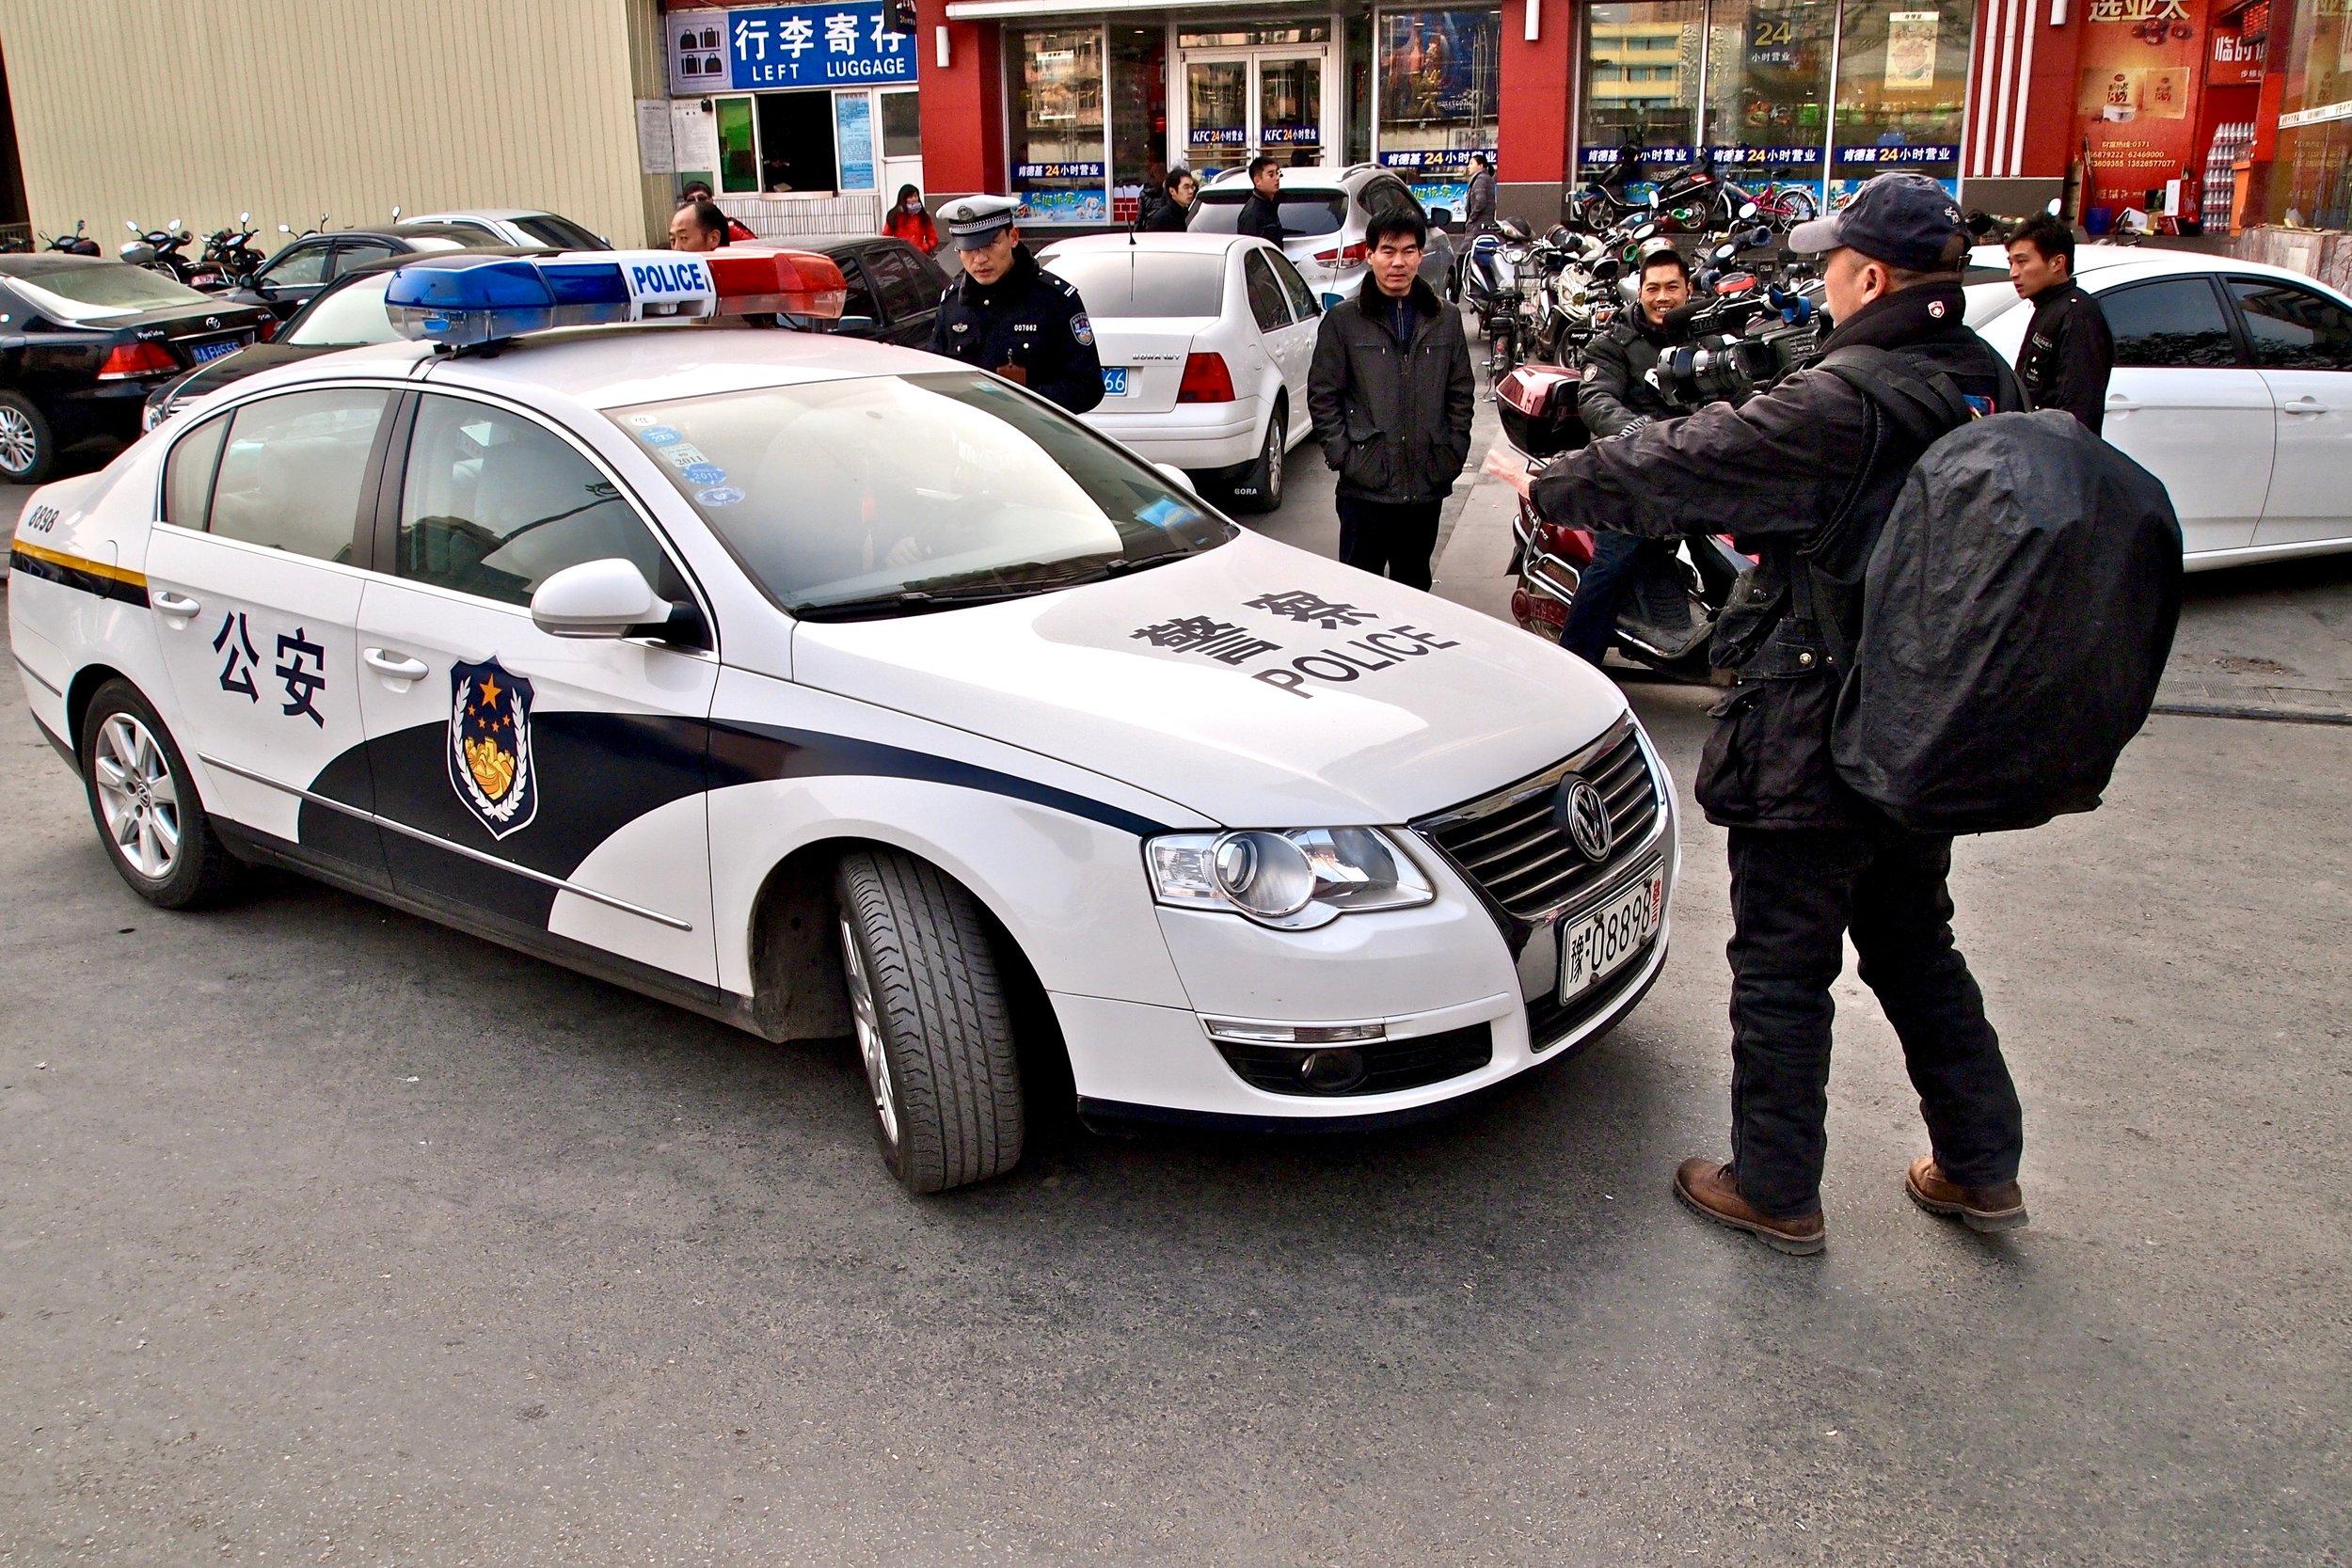 Lu Jianfu filming an illegally parked police car in Zhengzhou, China. Photo: (C) Remko Tanis